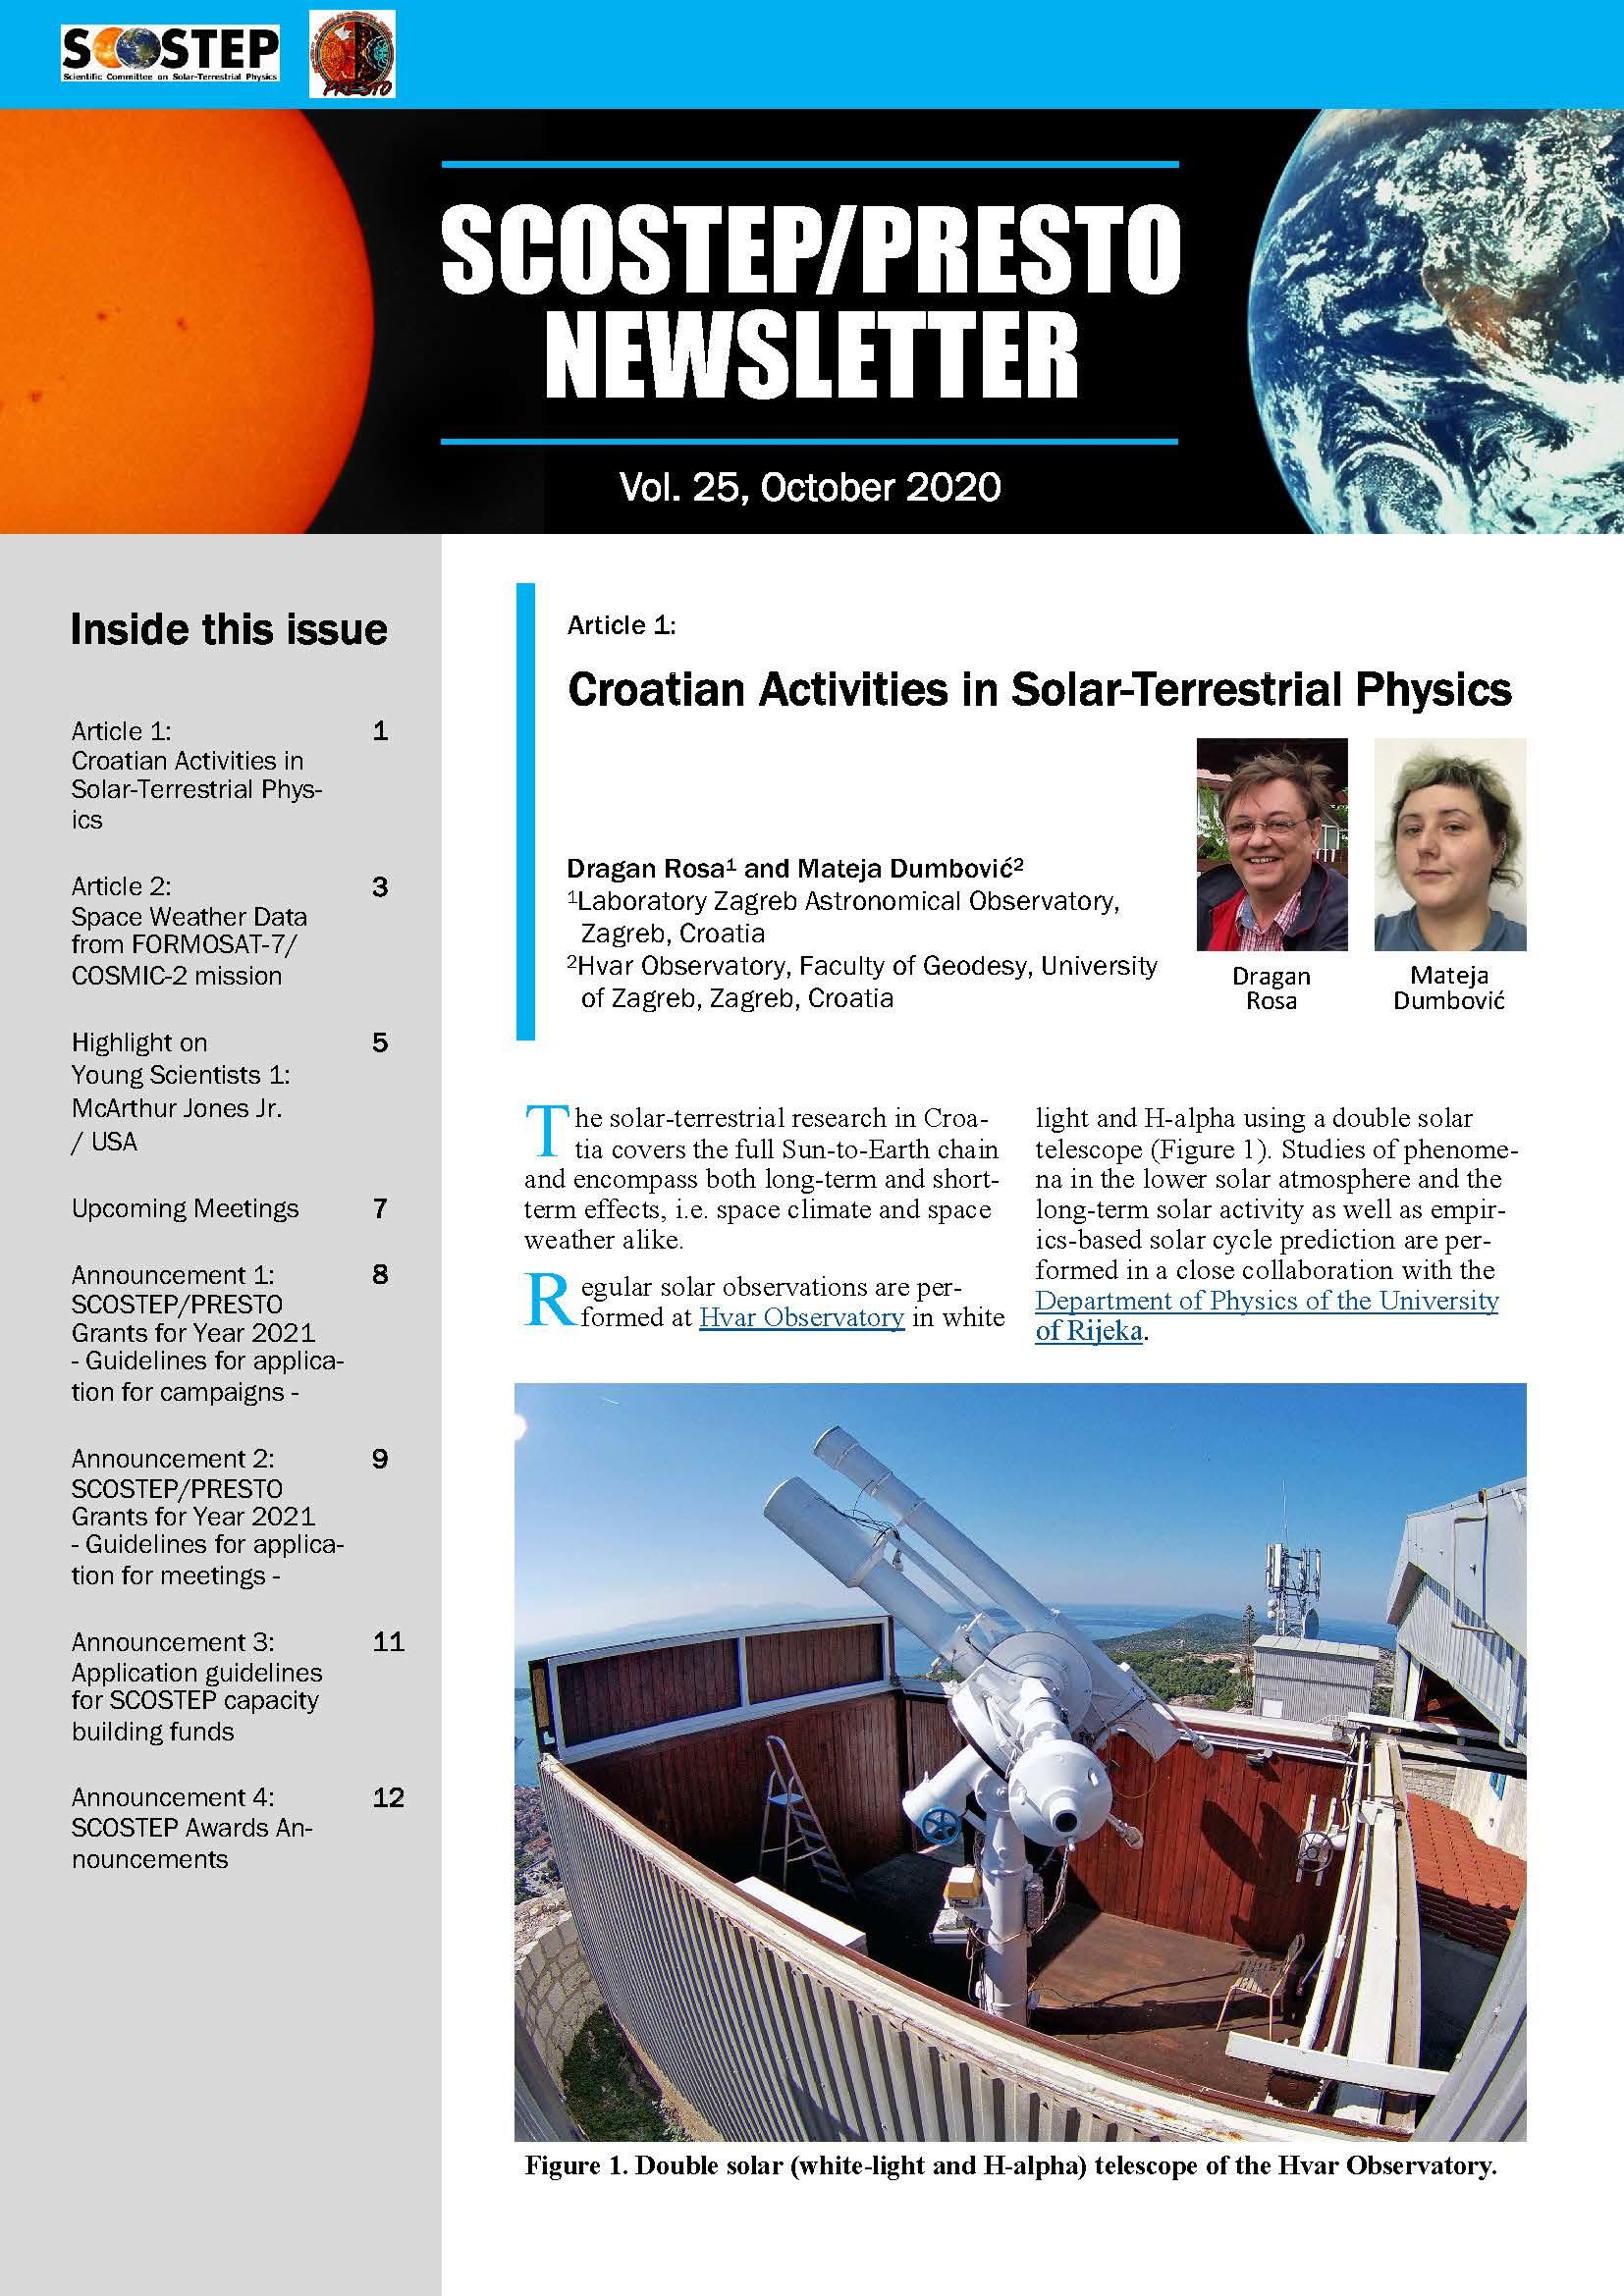 SCOSTEP_PRESTO_Newsletter_Vol25_high_reso_01.jpg